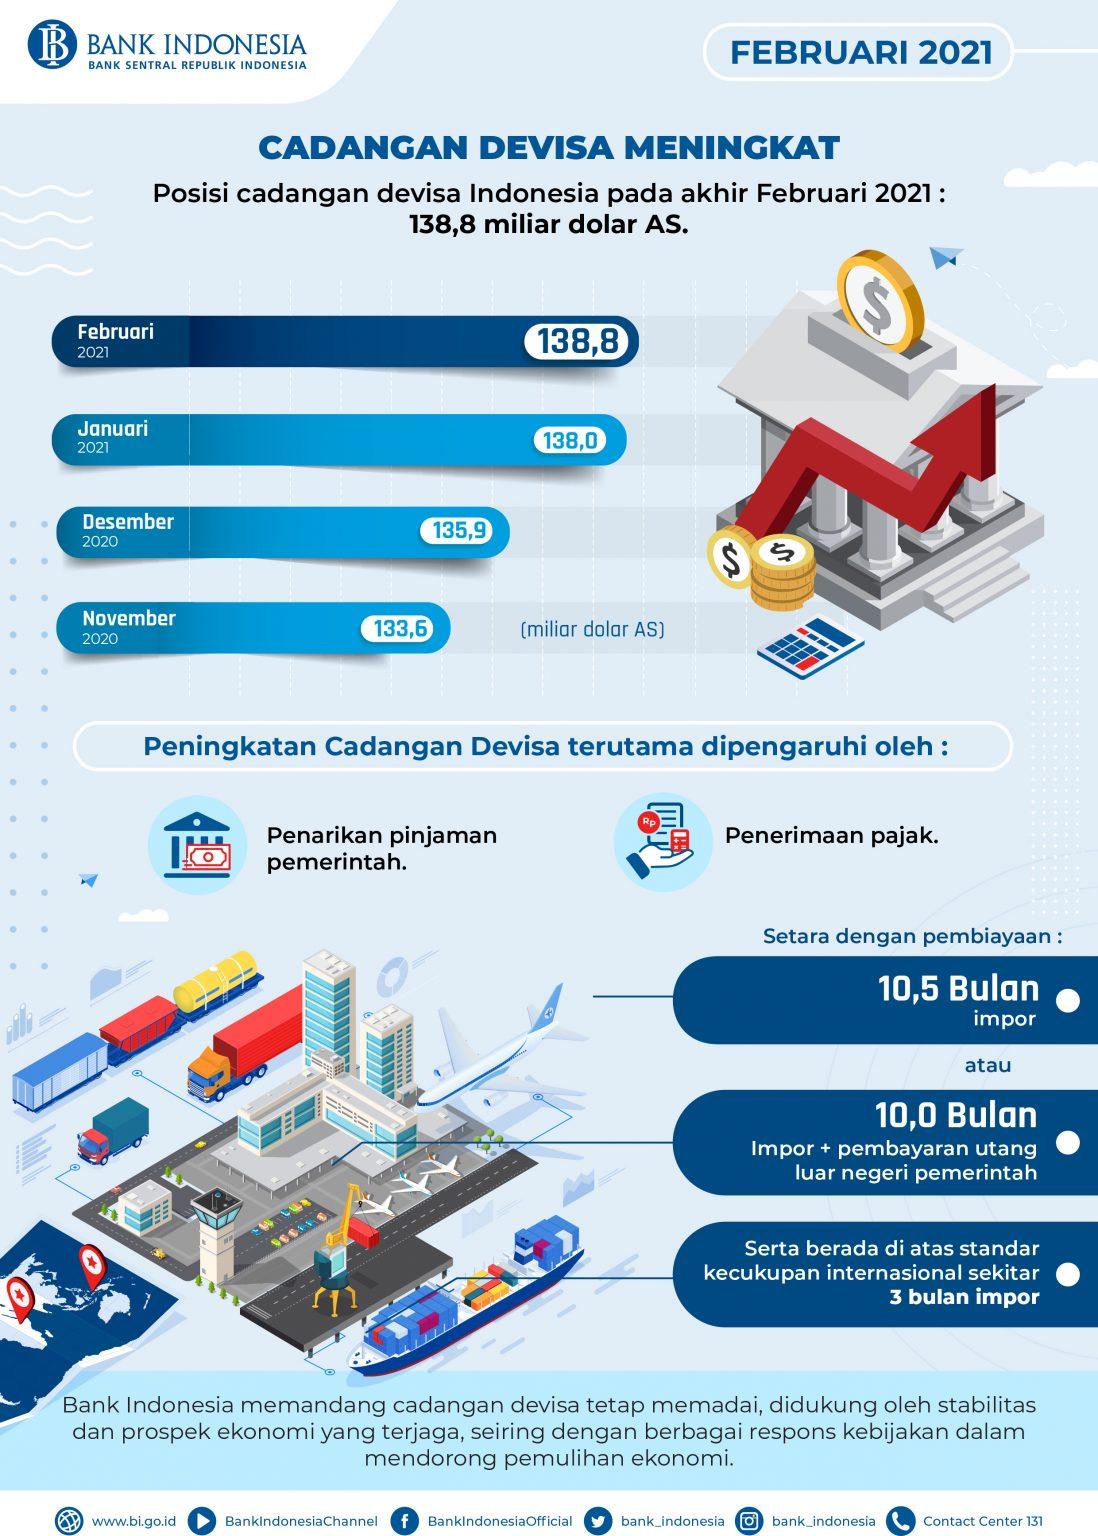 Cadangan Devisa Februari 2021 Meningkat ke USD138,8 Miliar ...